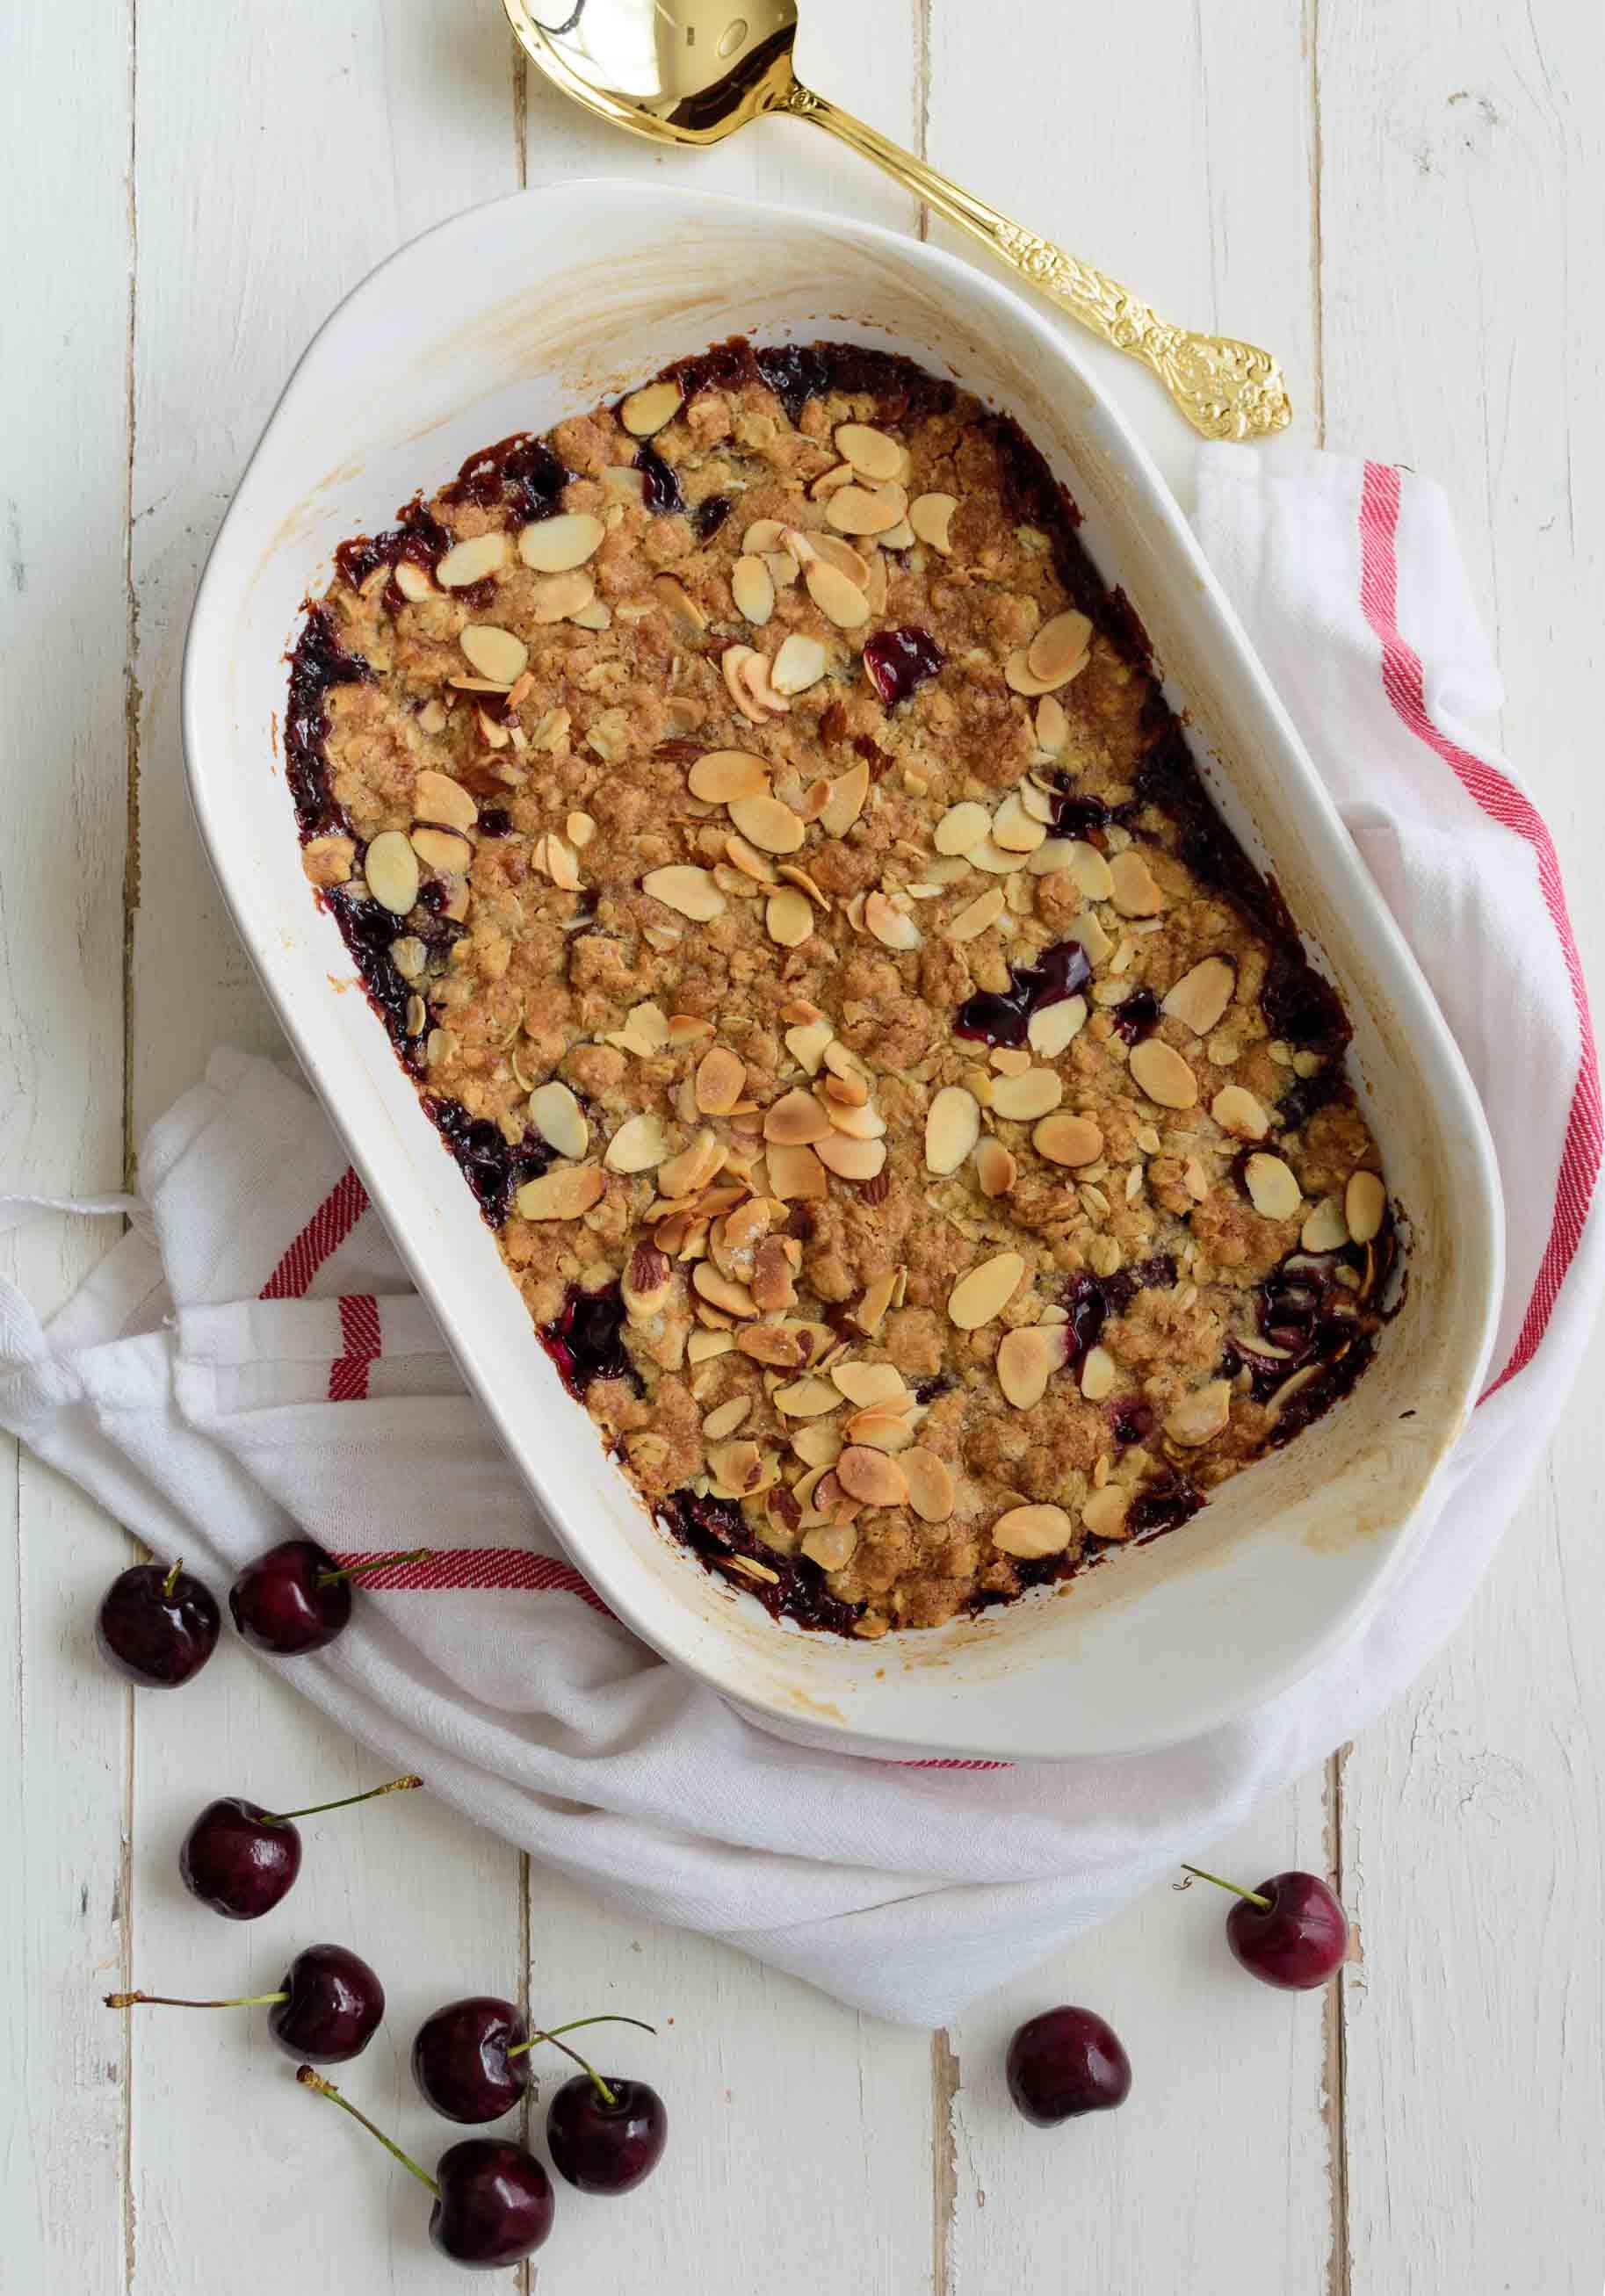 Cherry Almond Crumble - Pepper Delight #pepperdelightblog #recipe #cherry #crumble #crisp #cobbler #celebration #christmas #dessert #summer #fall #party #holidayrecipes #summerdesserts